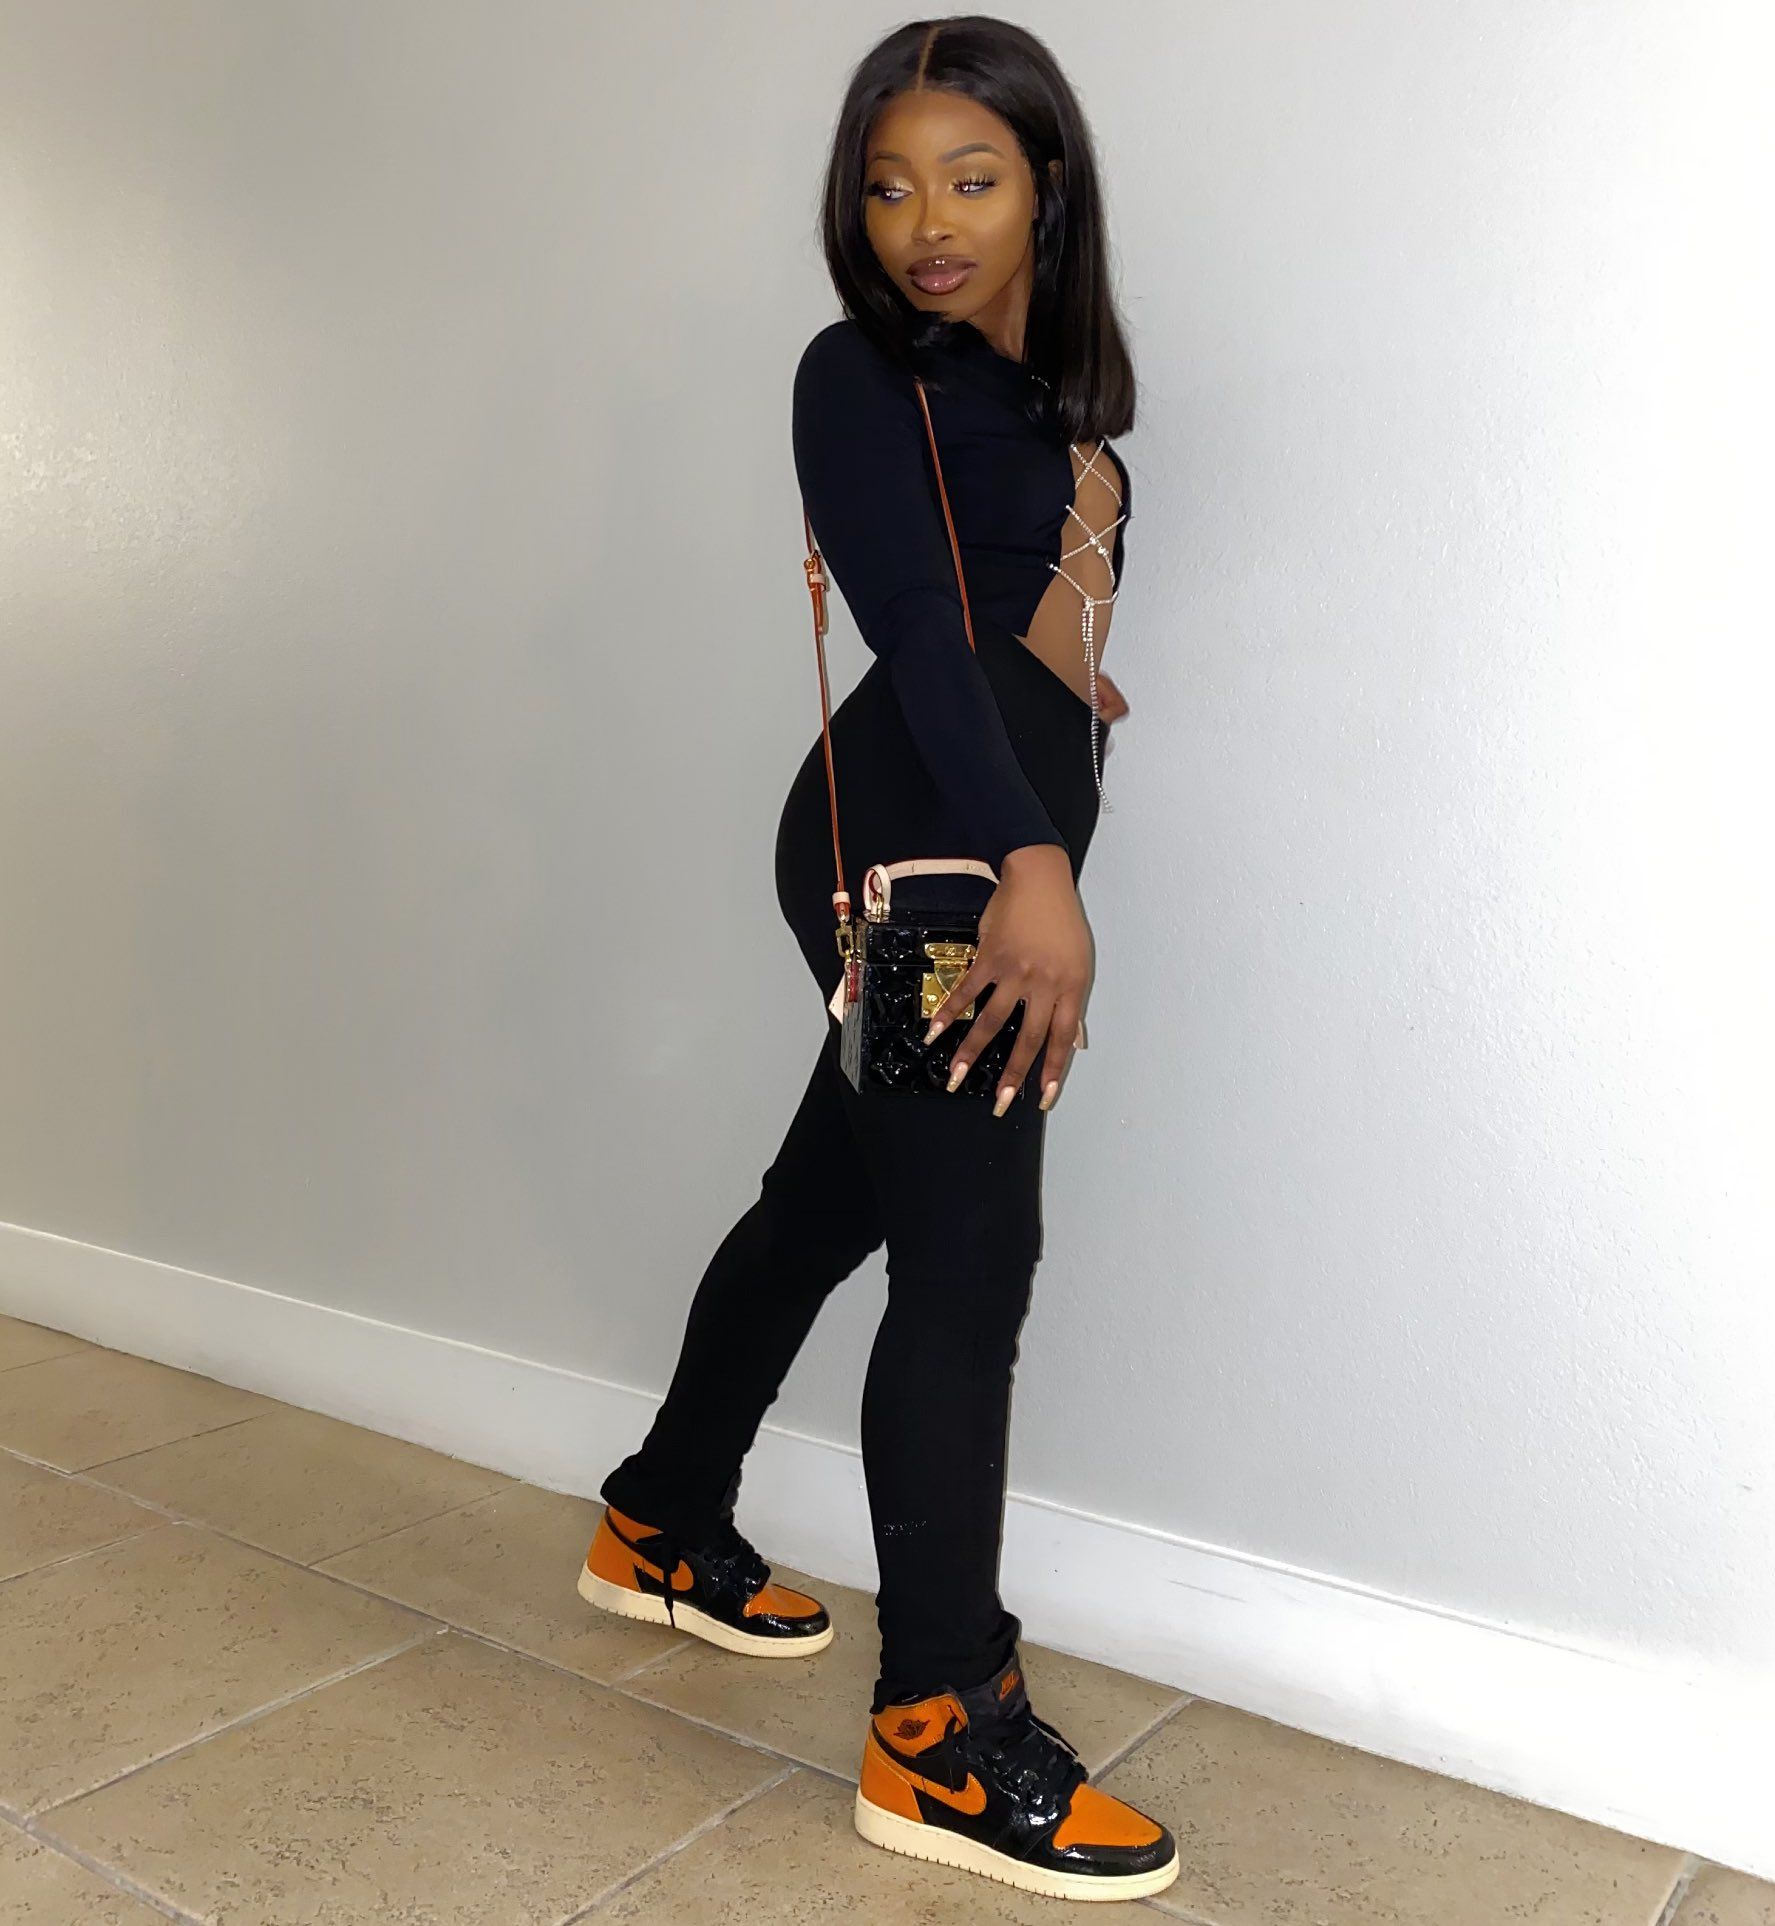 Posh_midget  | Black girl outfits, Pretty black girls